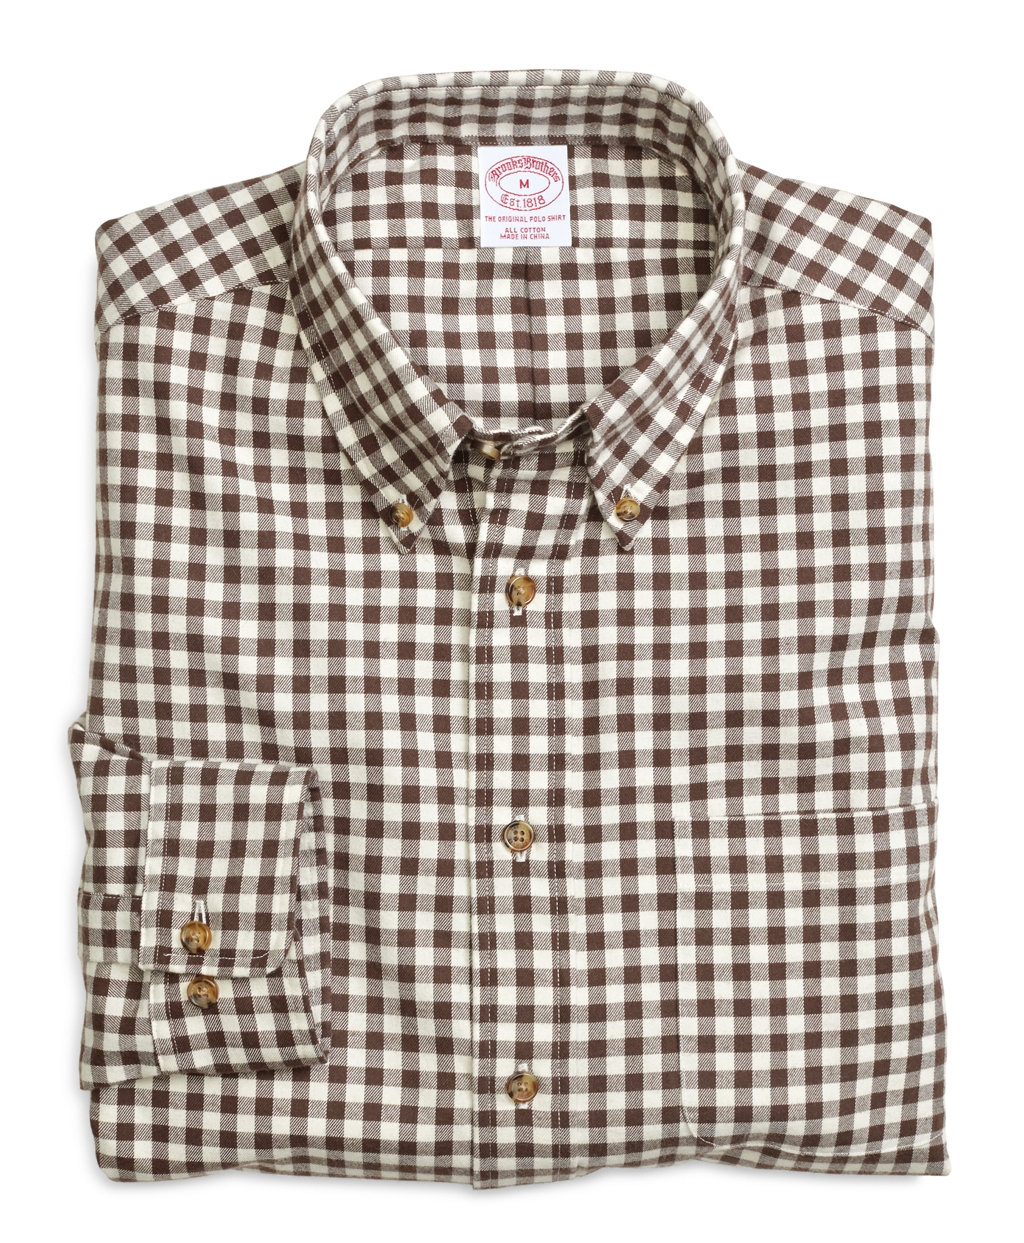 Brooks brothers regular fit flannel gingham sport shirt in for Brooks brothers sports shirts